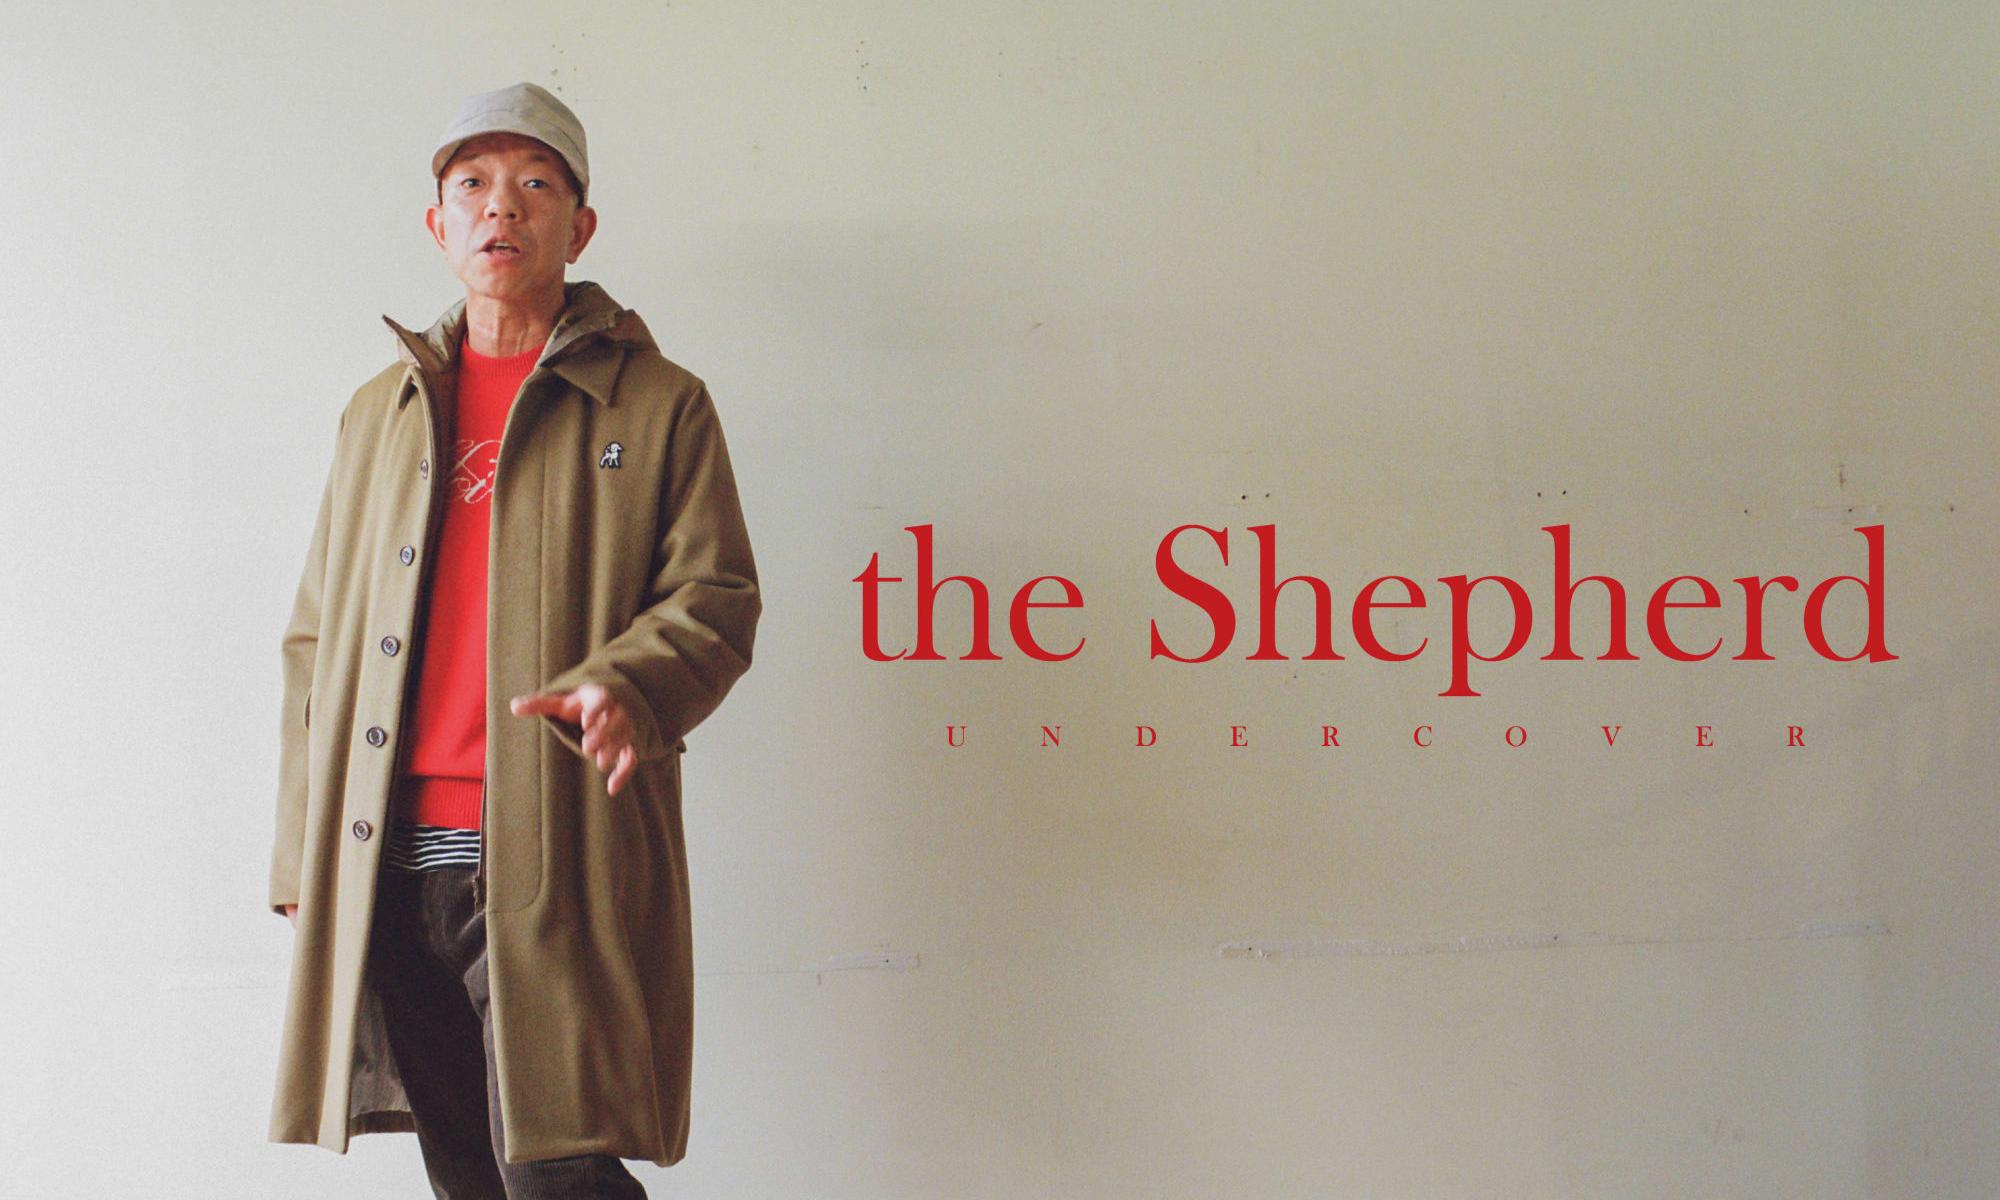 The Shepherd UNDERCOVER 2020 秋冬系列正式发布